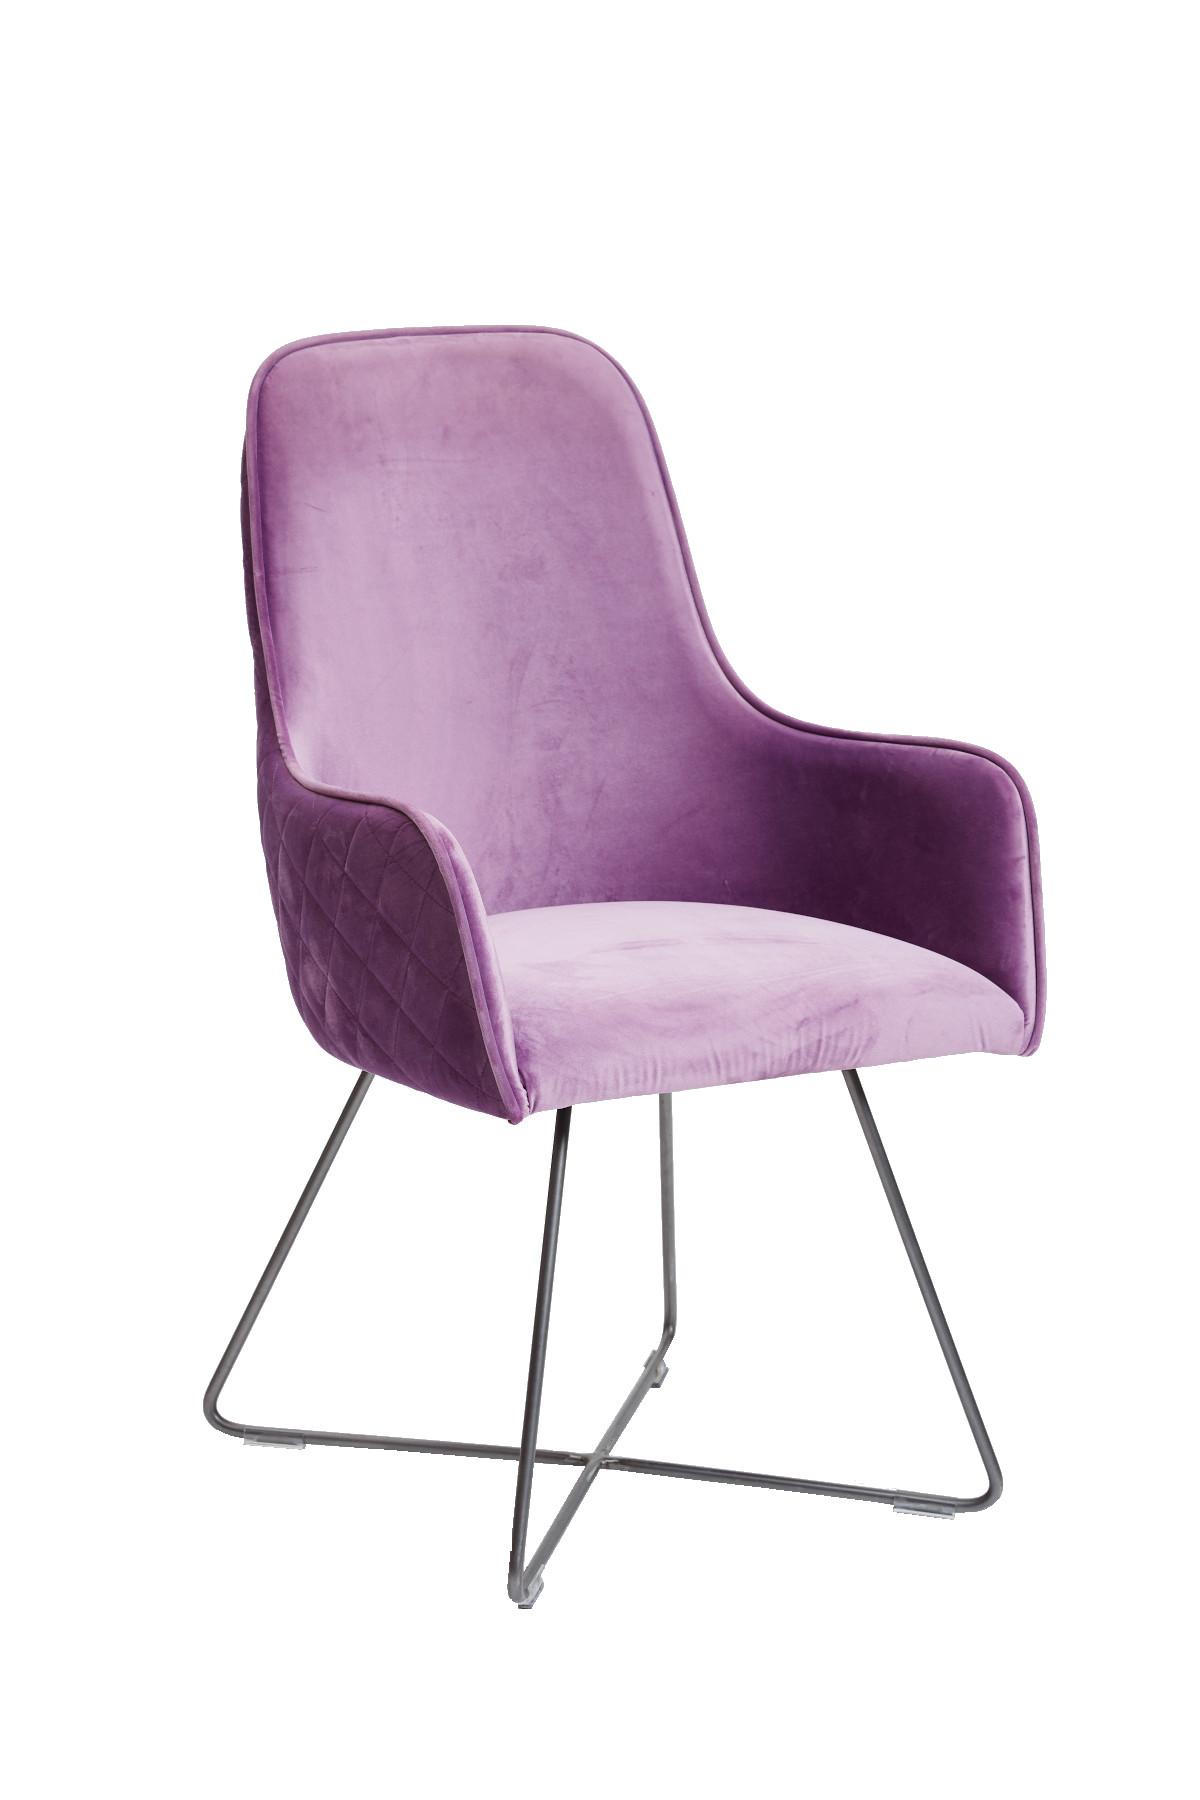 Utah Dining Chair - Lilac